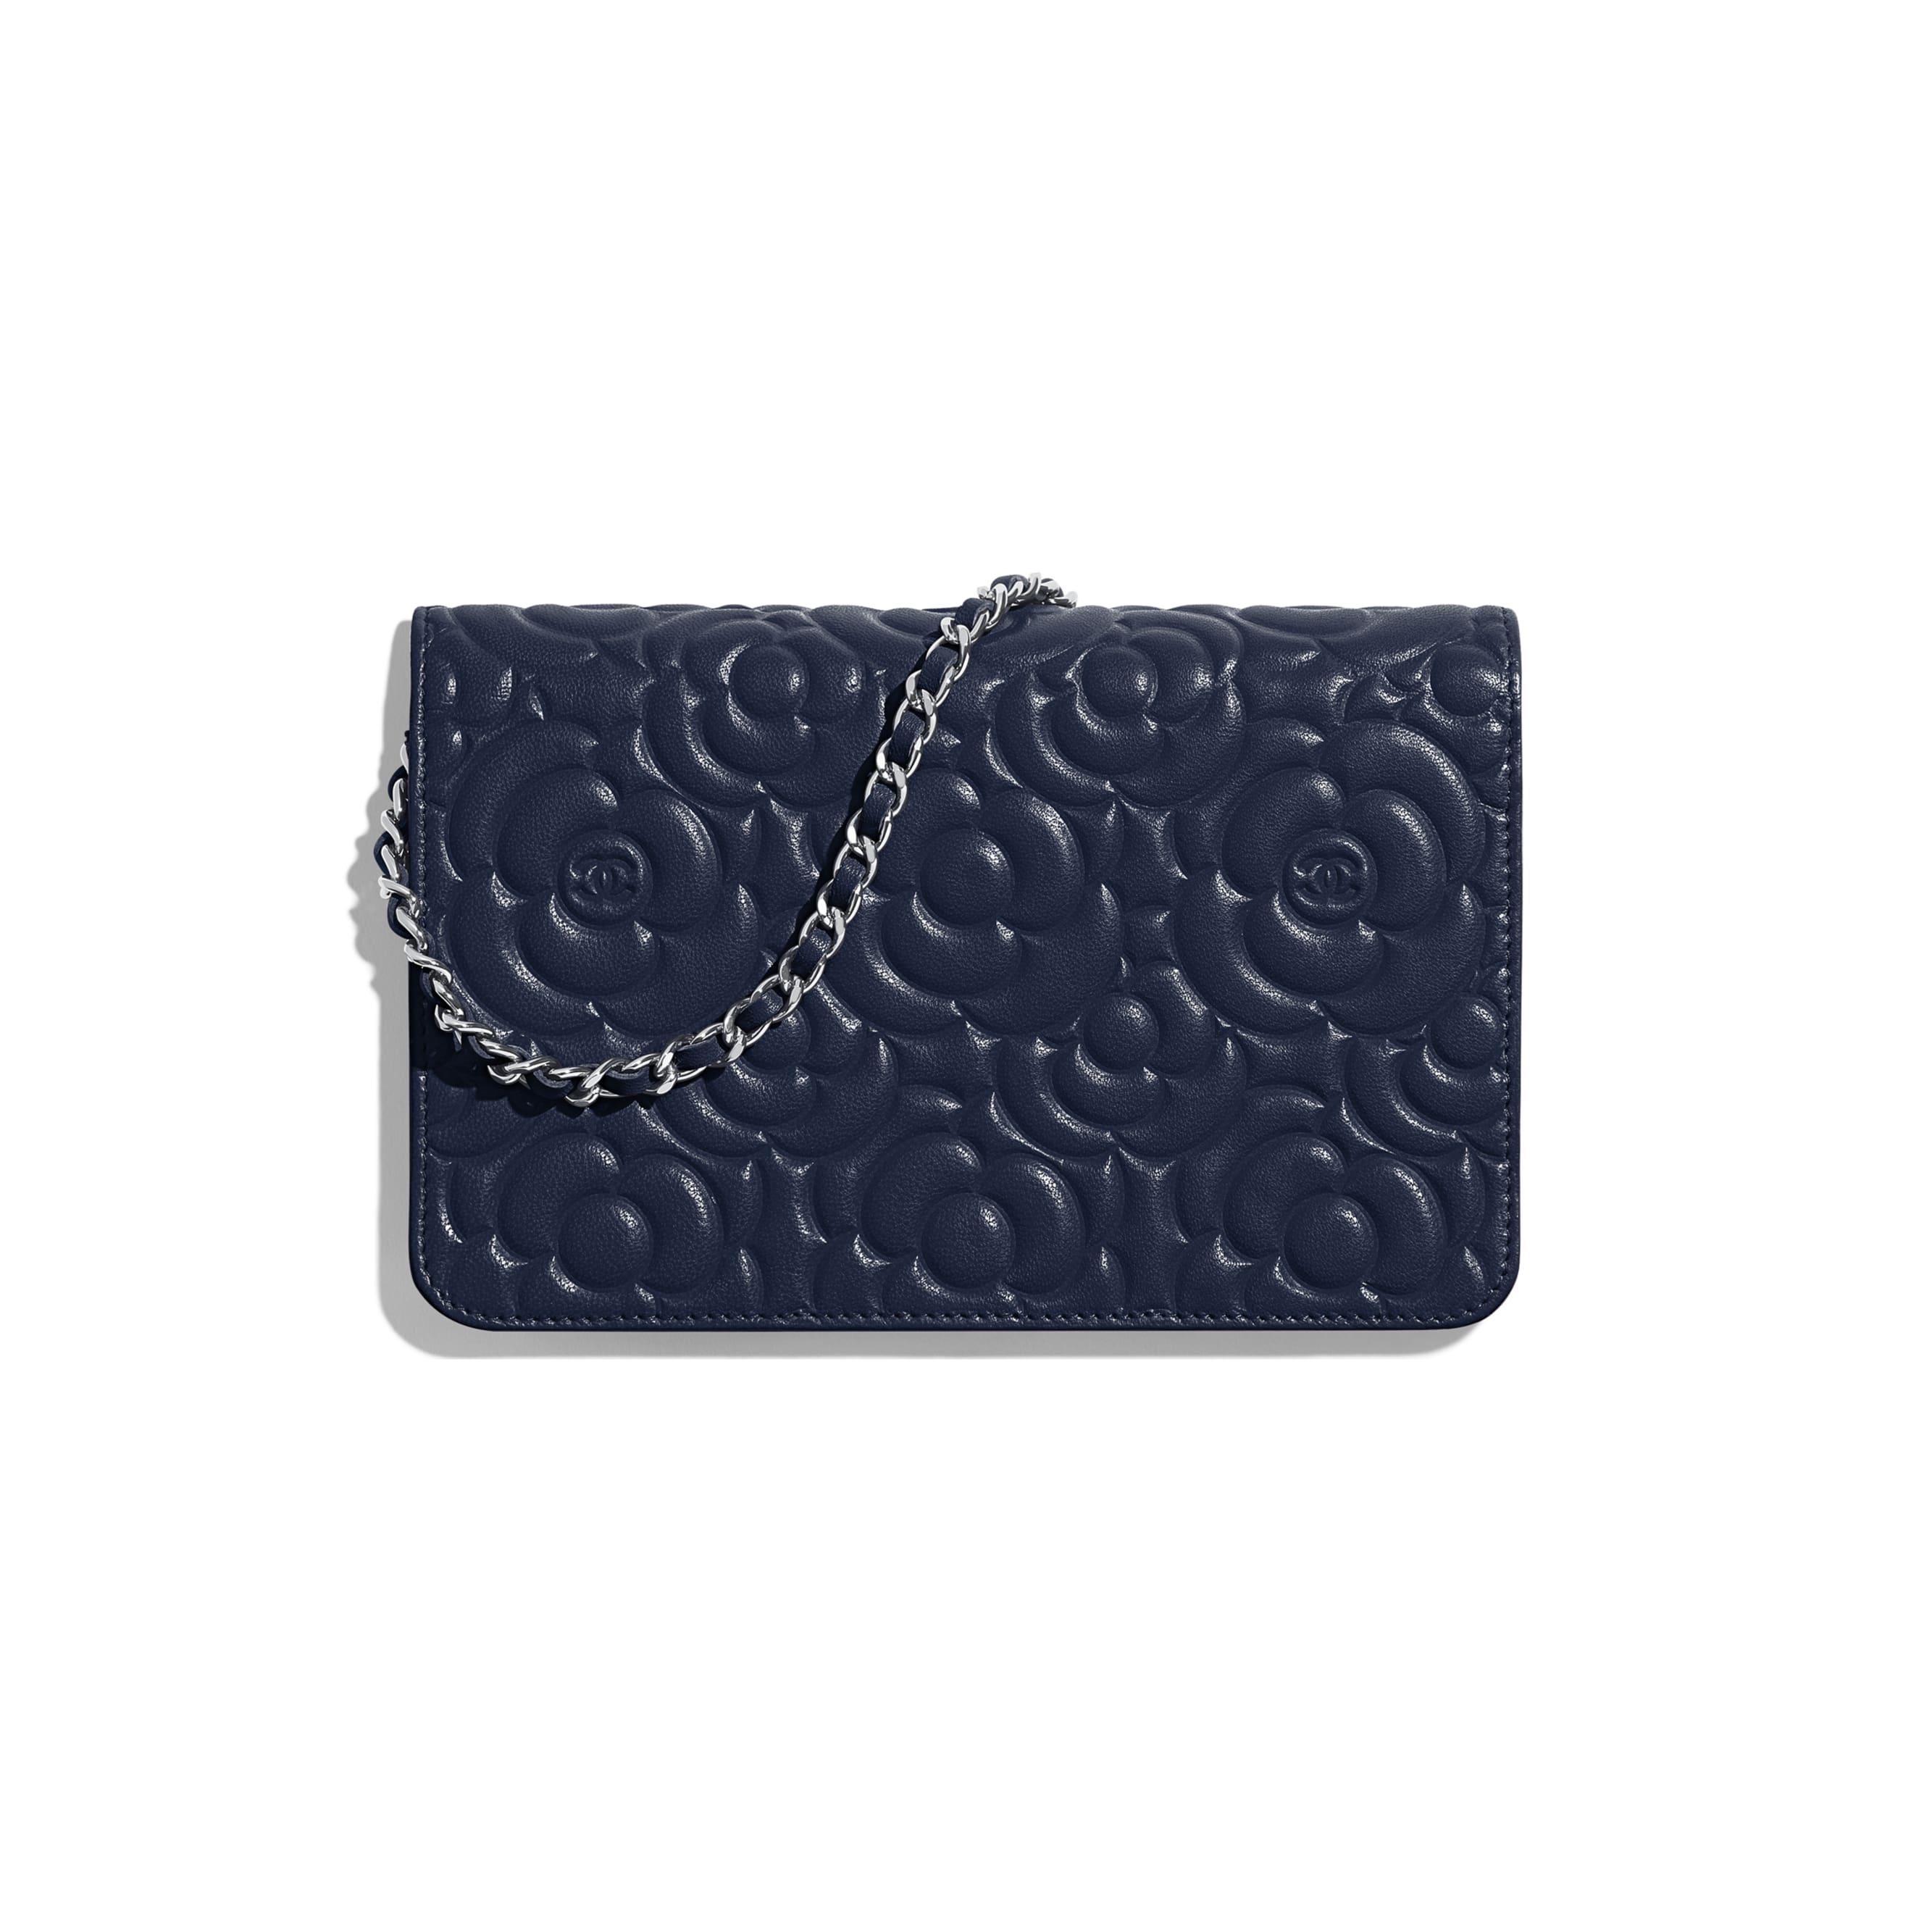 Wallet on Chain - Navy Blue - Lambskin & Silver-Tone Metal - Alternative view - see standard sized version